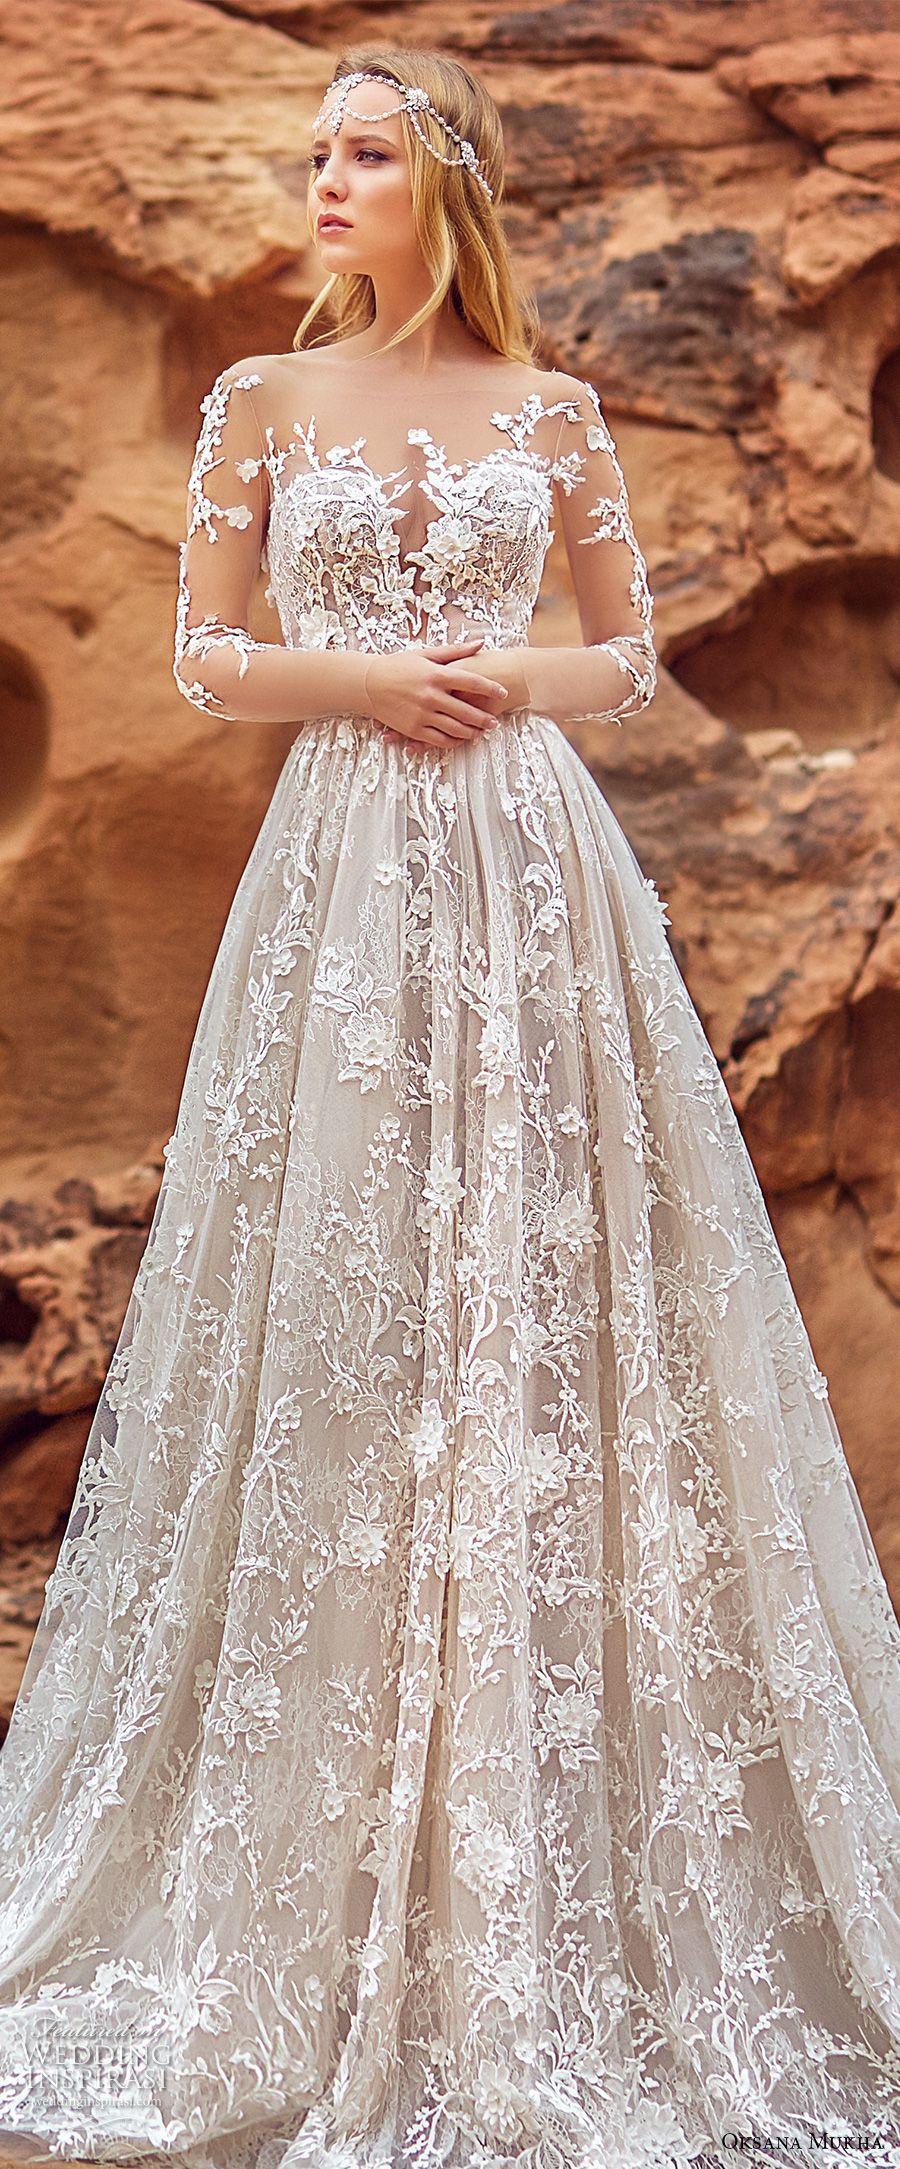 Oksana mukha wedding dresses wedding dress weddings and wedding